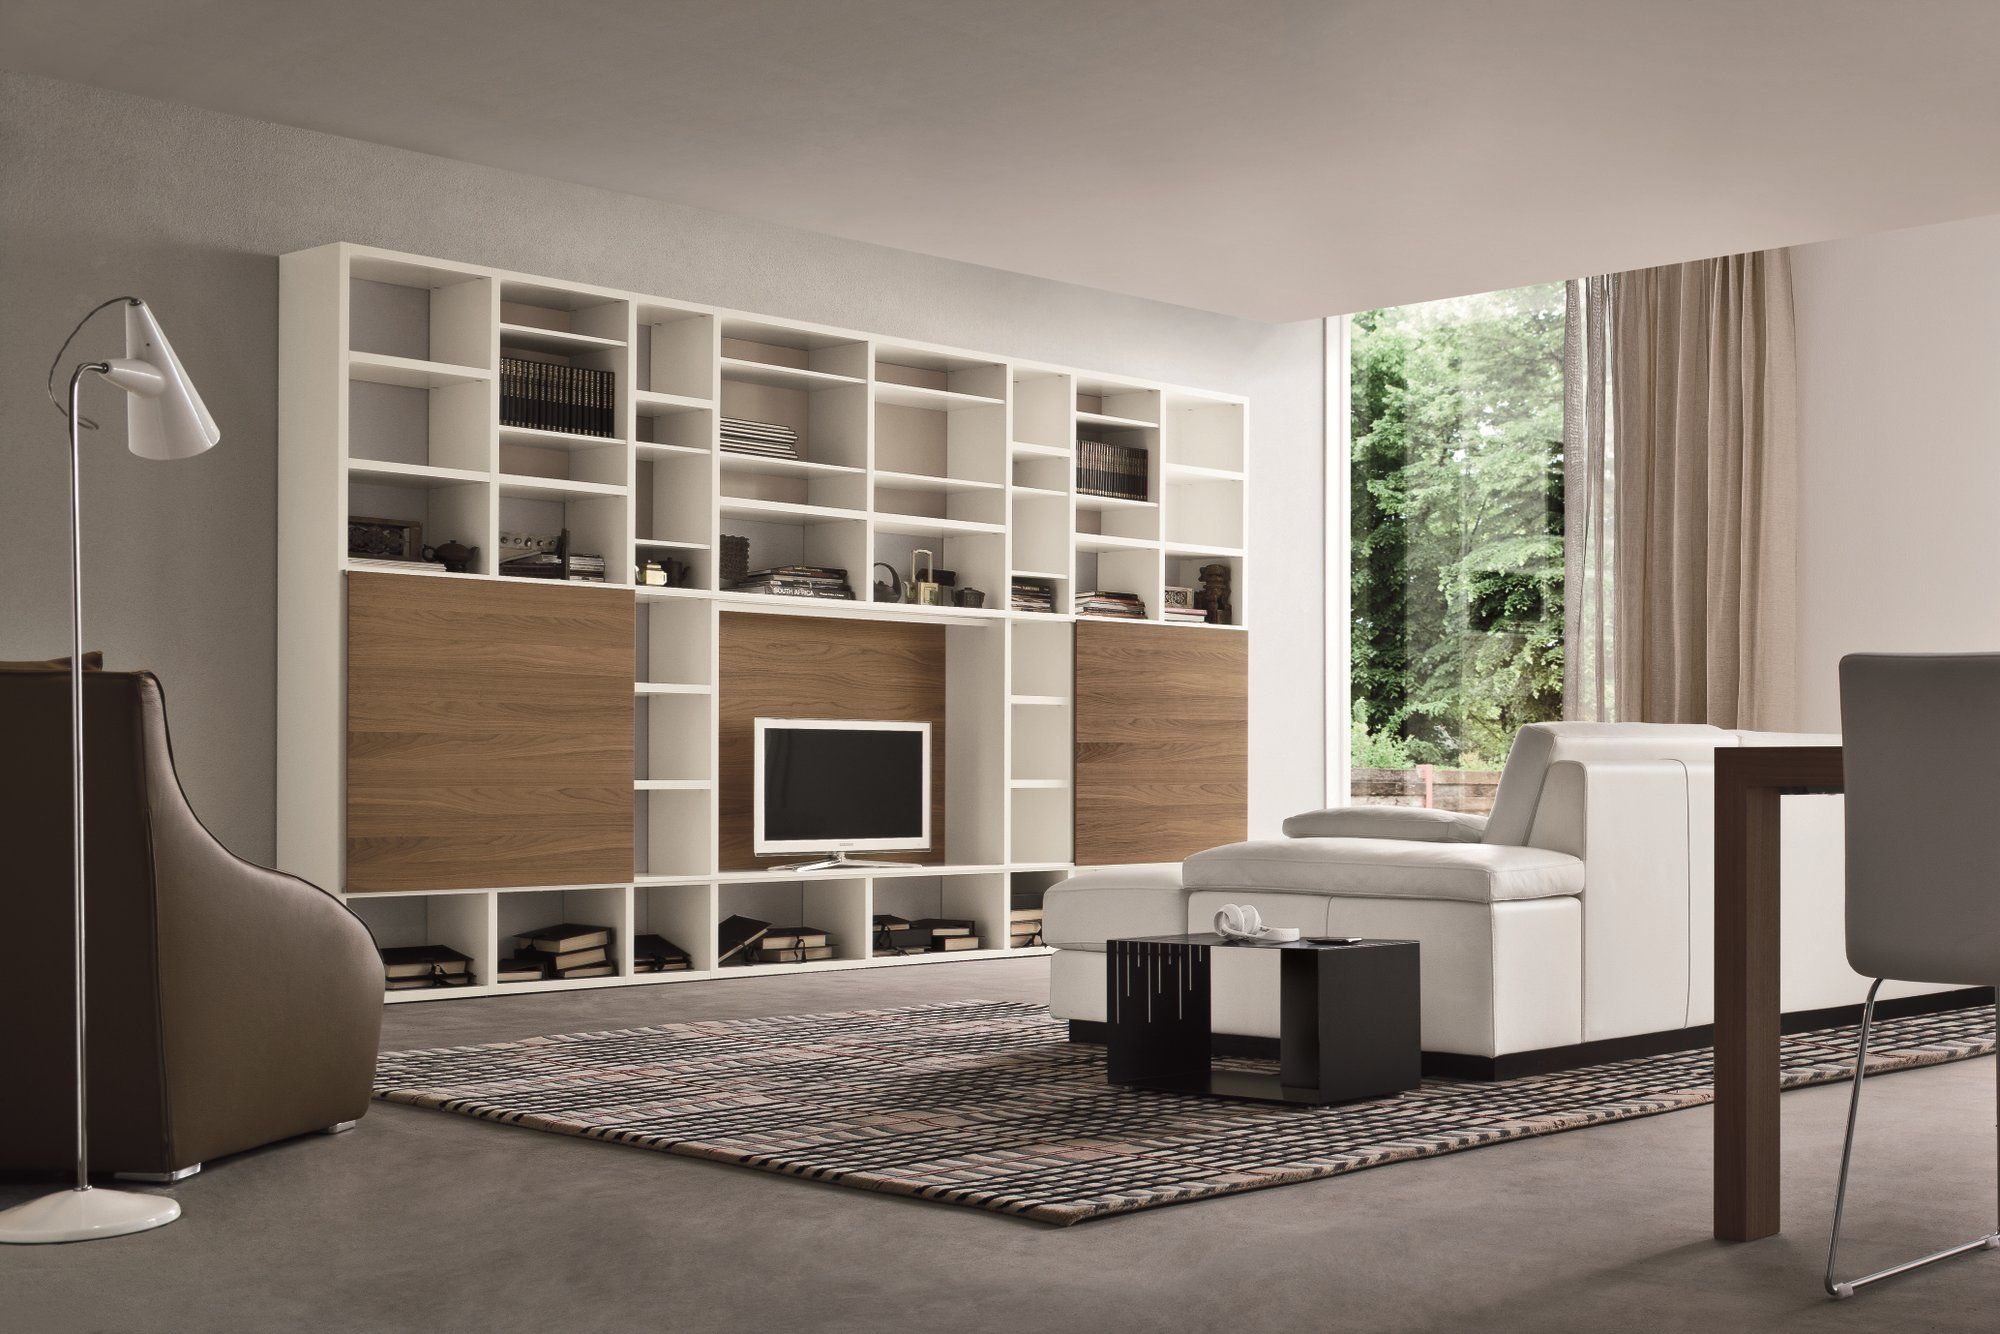 Mueble Modular De Pared Lacado Con Soporte Para Tv Speed O  # Mueble Soporte Tv Diseno